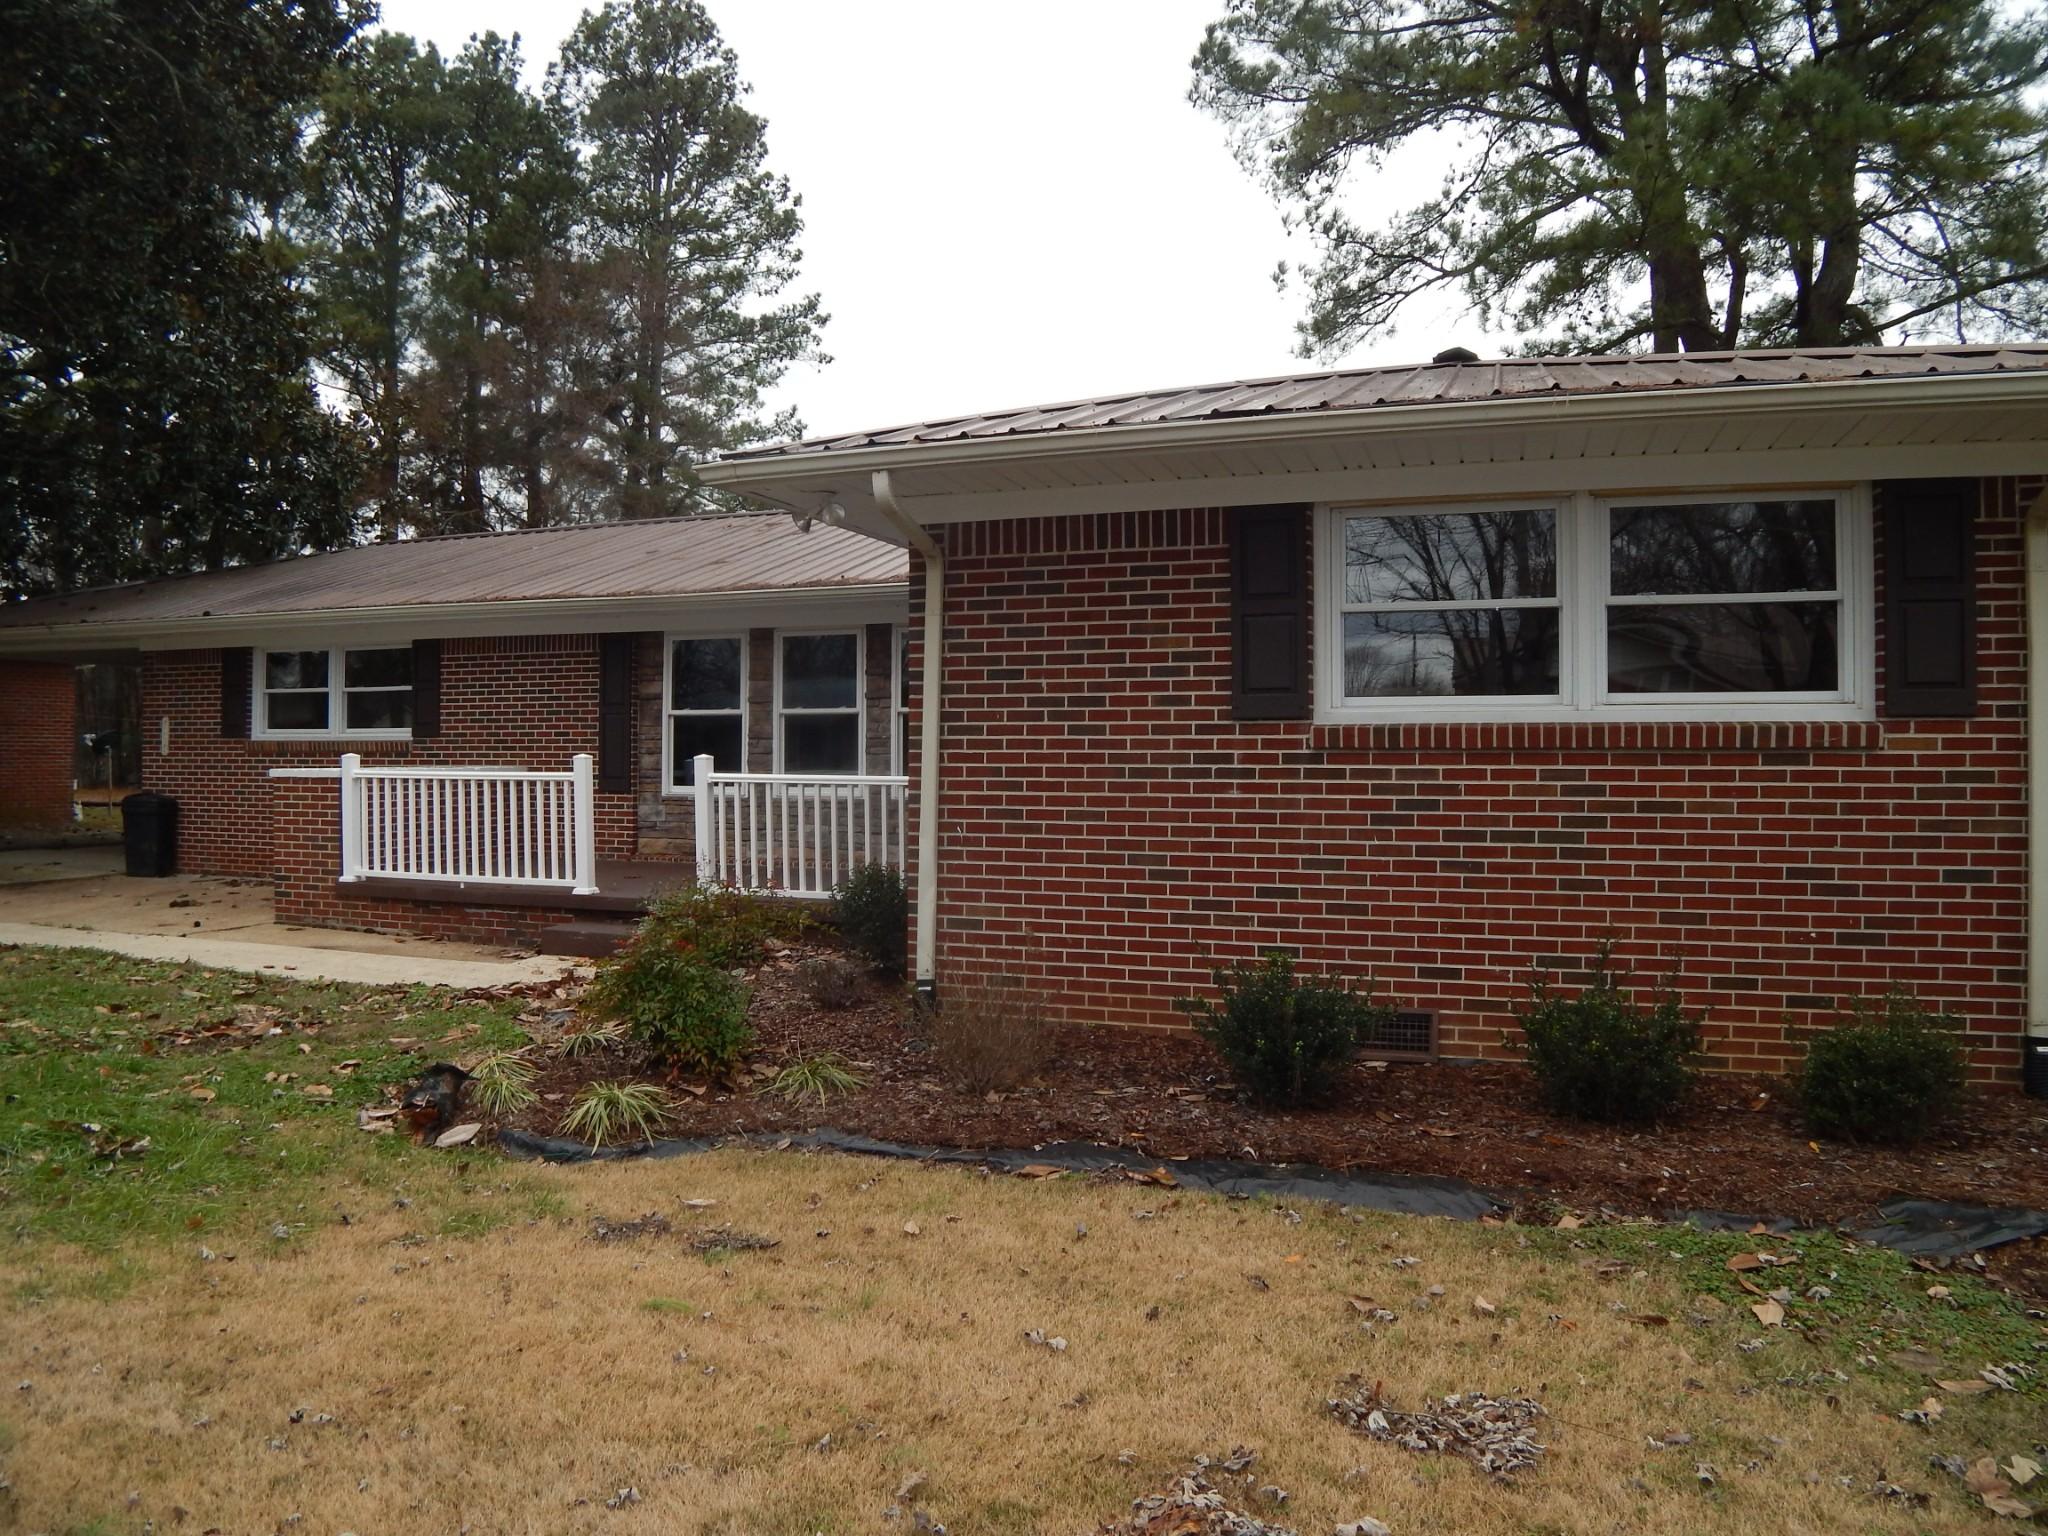 115 Smith St, Huntland, TN 37345 - Huntland, TN real estate listing